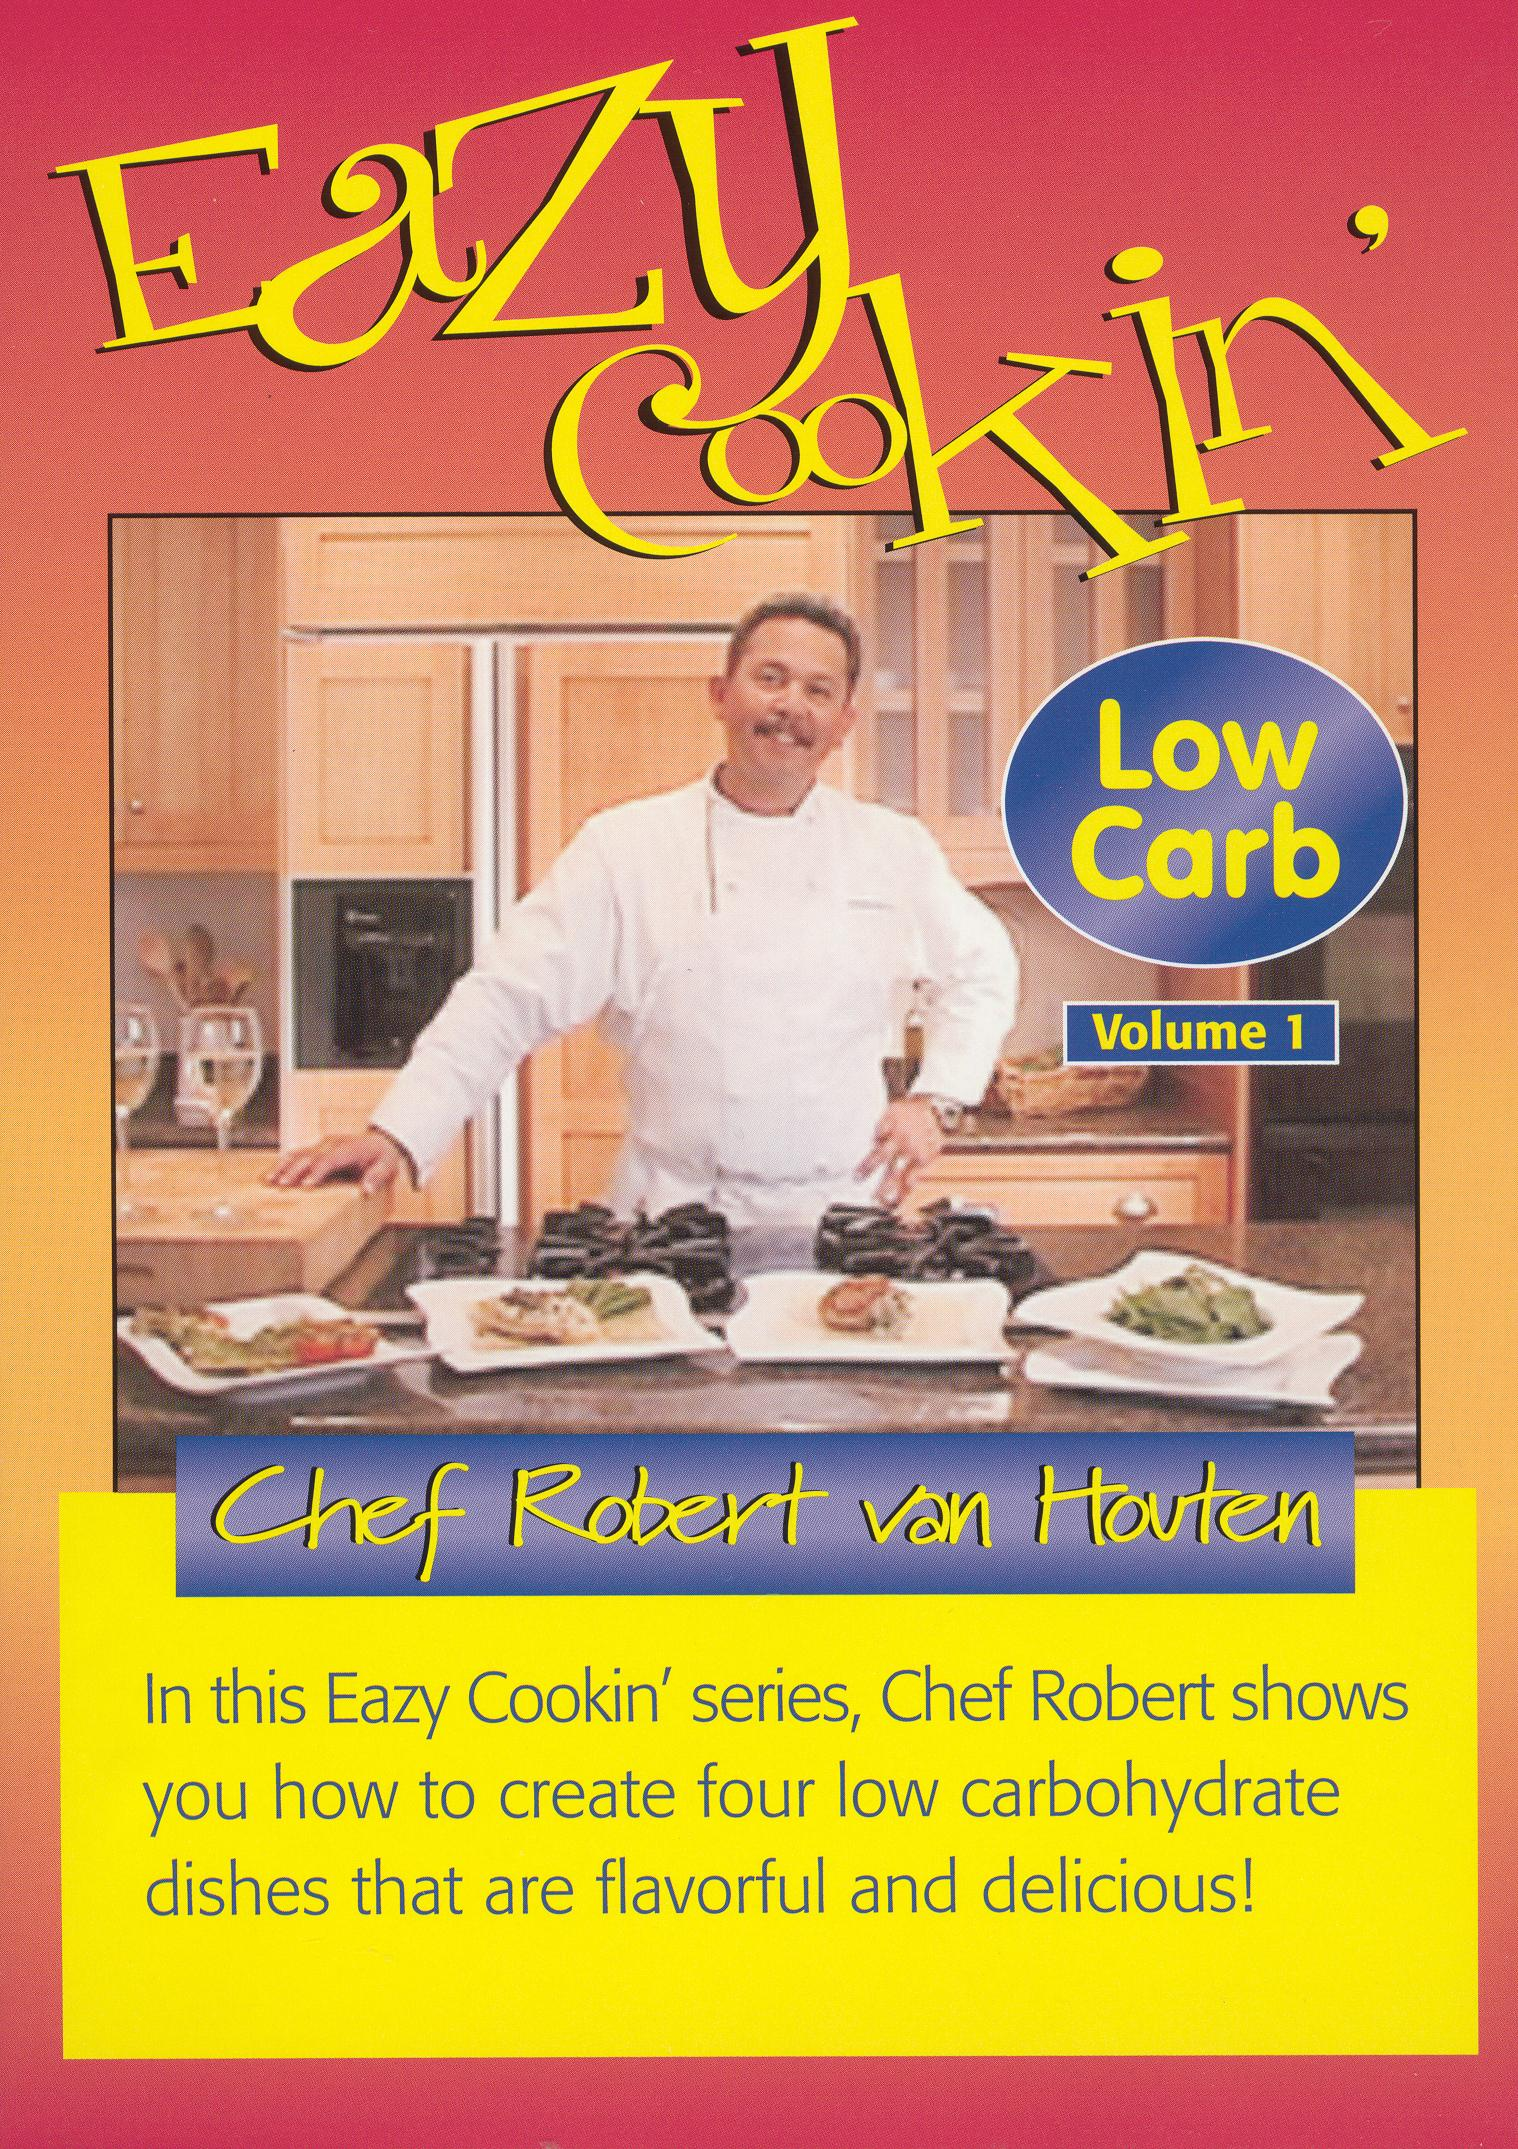 Eazy Cookin: Low Carb, Vol. 1